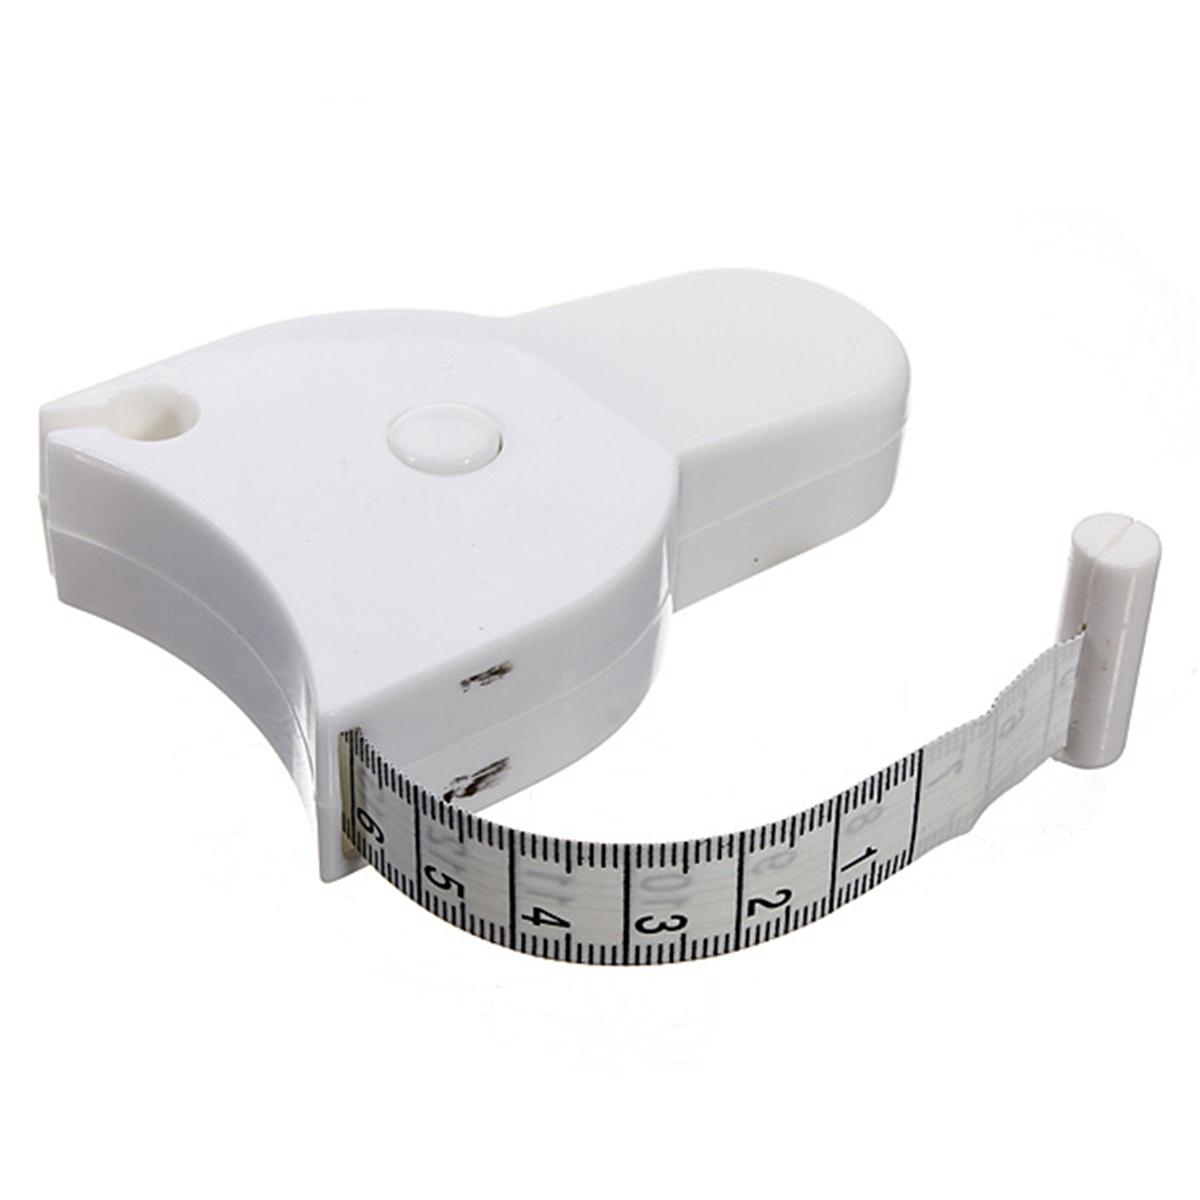 body tape measure caliper measuring waist measurement diet weight fat loss 1 5m ebay. Black Bedroom Furniture Sets. Home Design Ideas